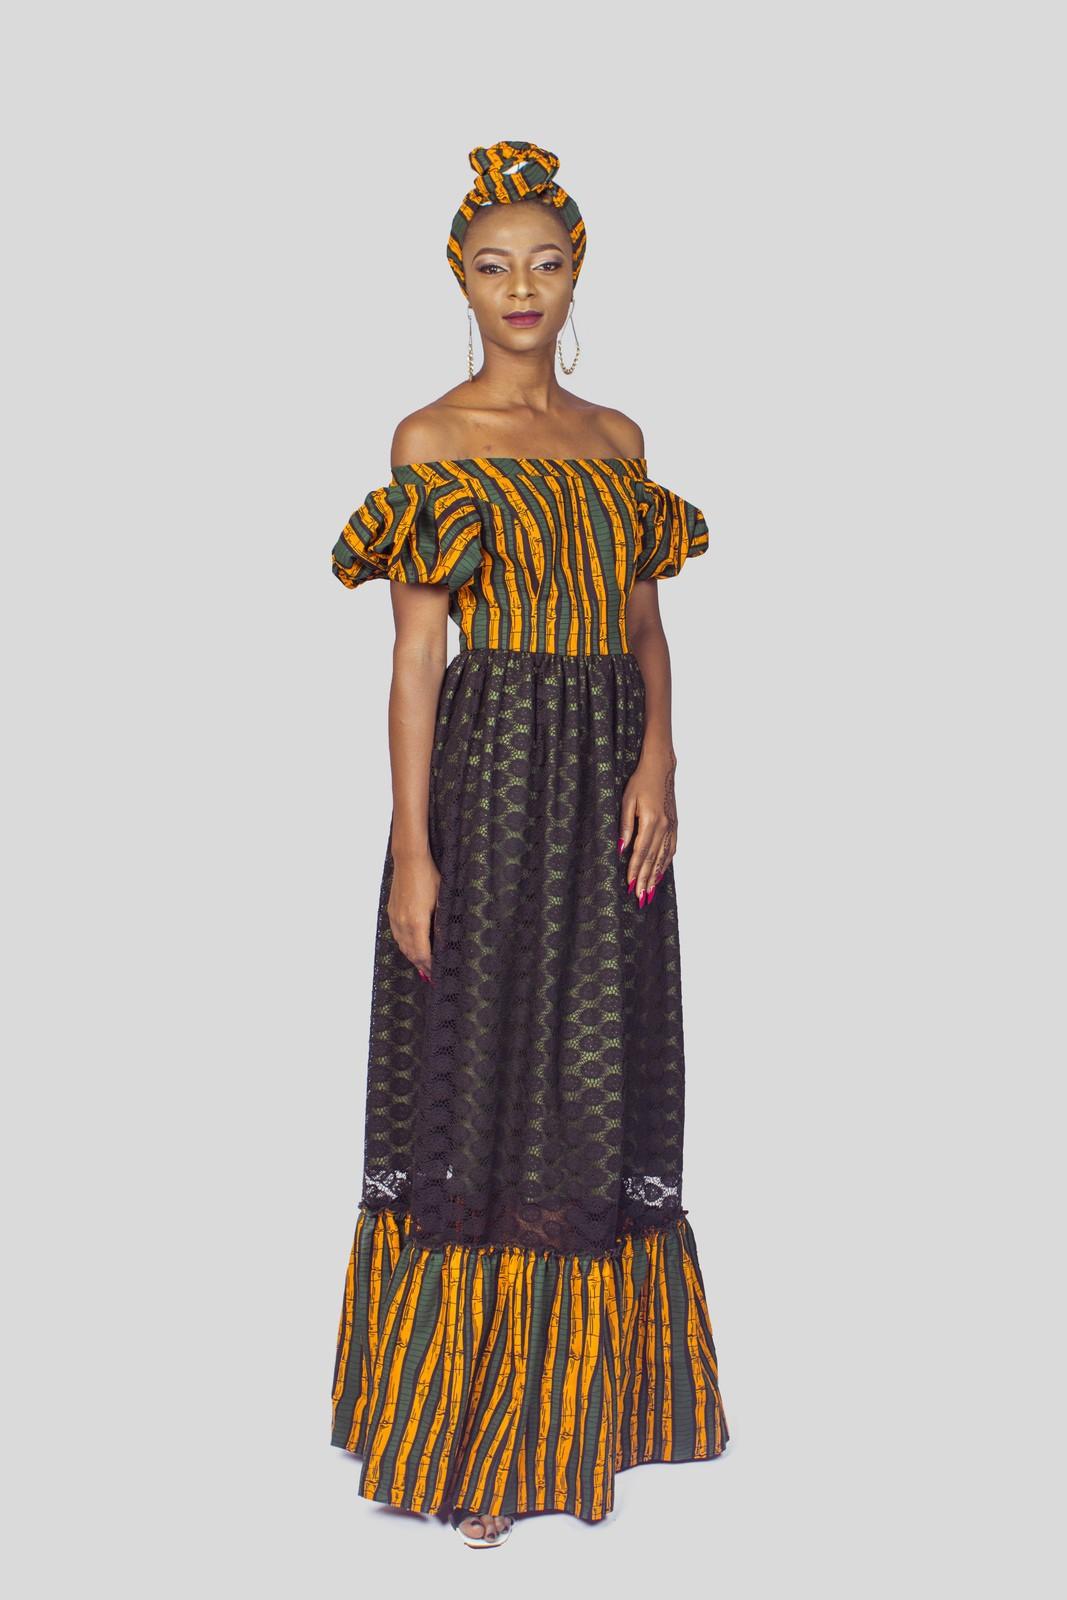 75ac3adf63f African Print Lace Dress